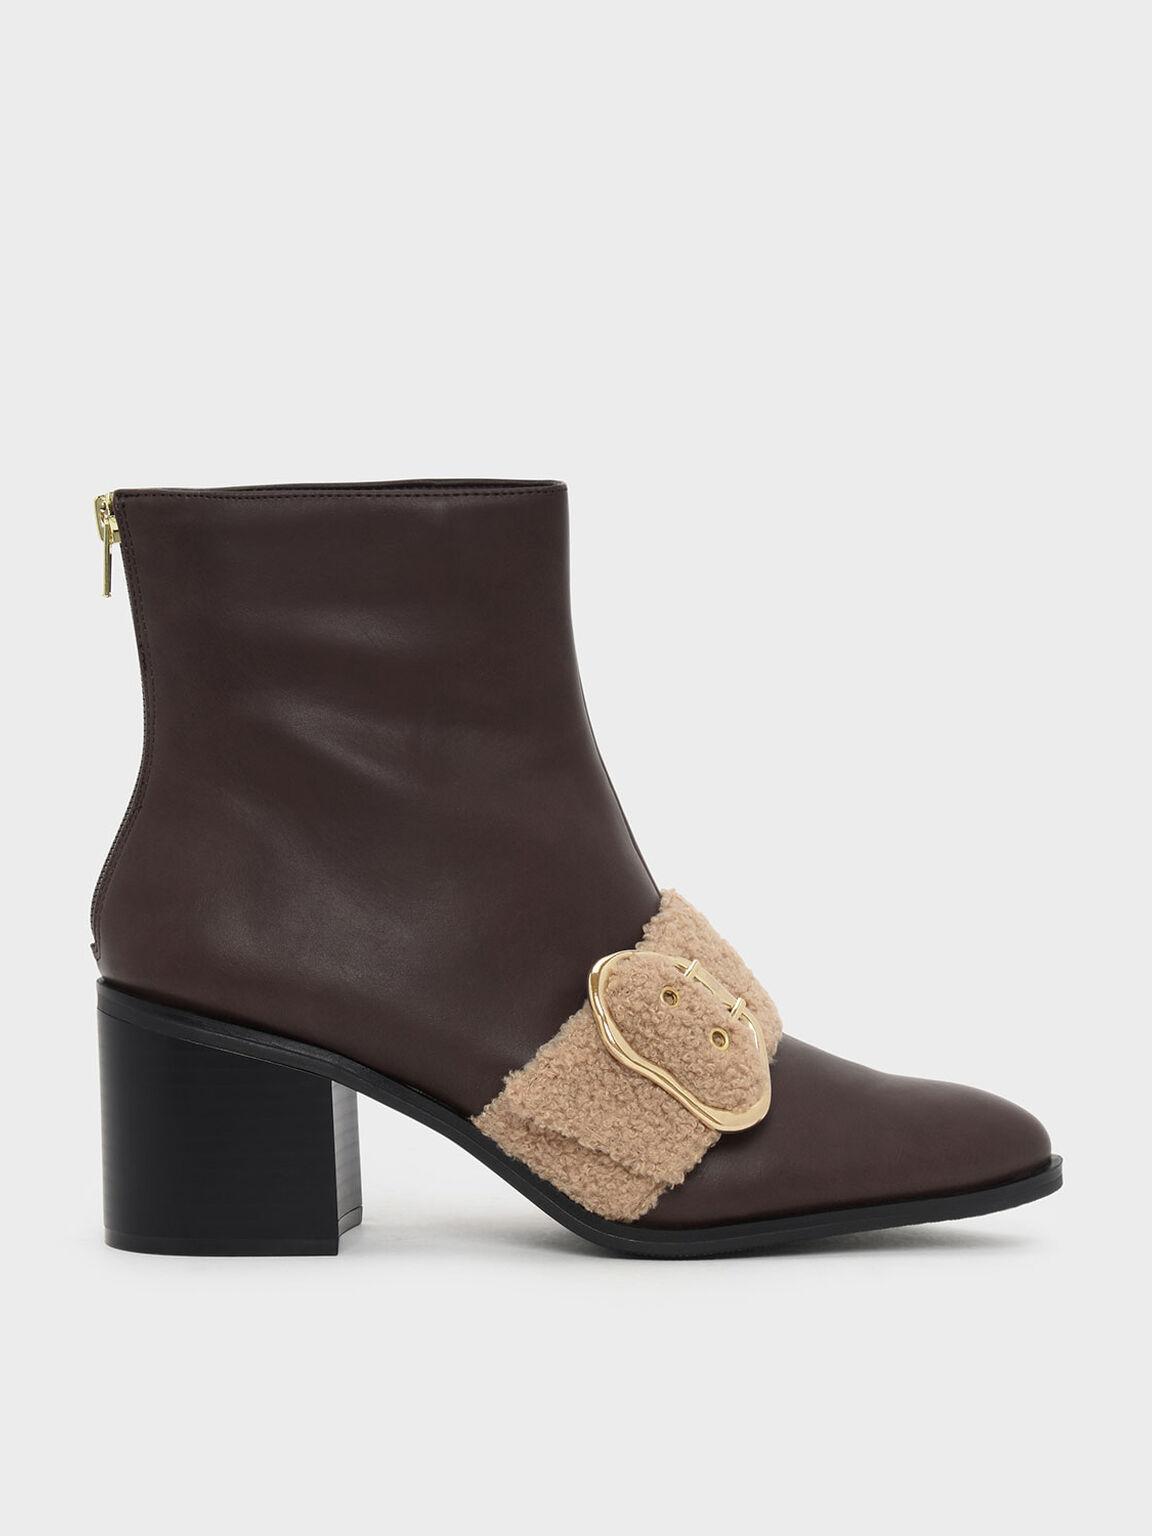 Furry Strap Detail Calf Boots, Dark Brown, hi-res